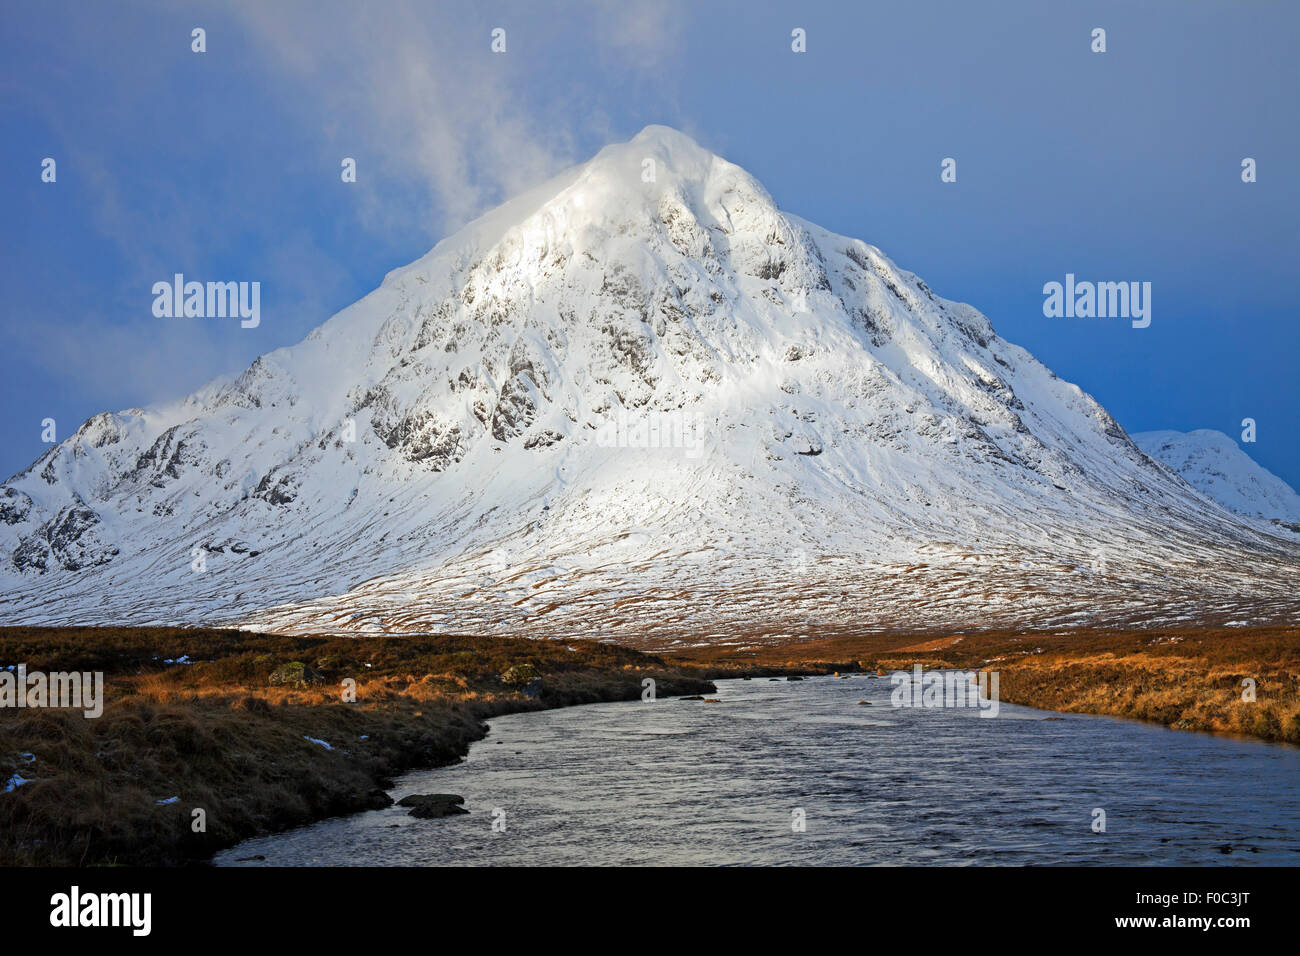 Snow on Buachaille Etive Mor mountain Lochaber Scotland UK - Stock Image